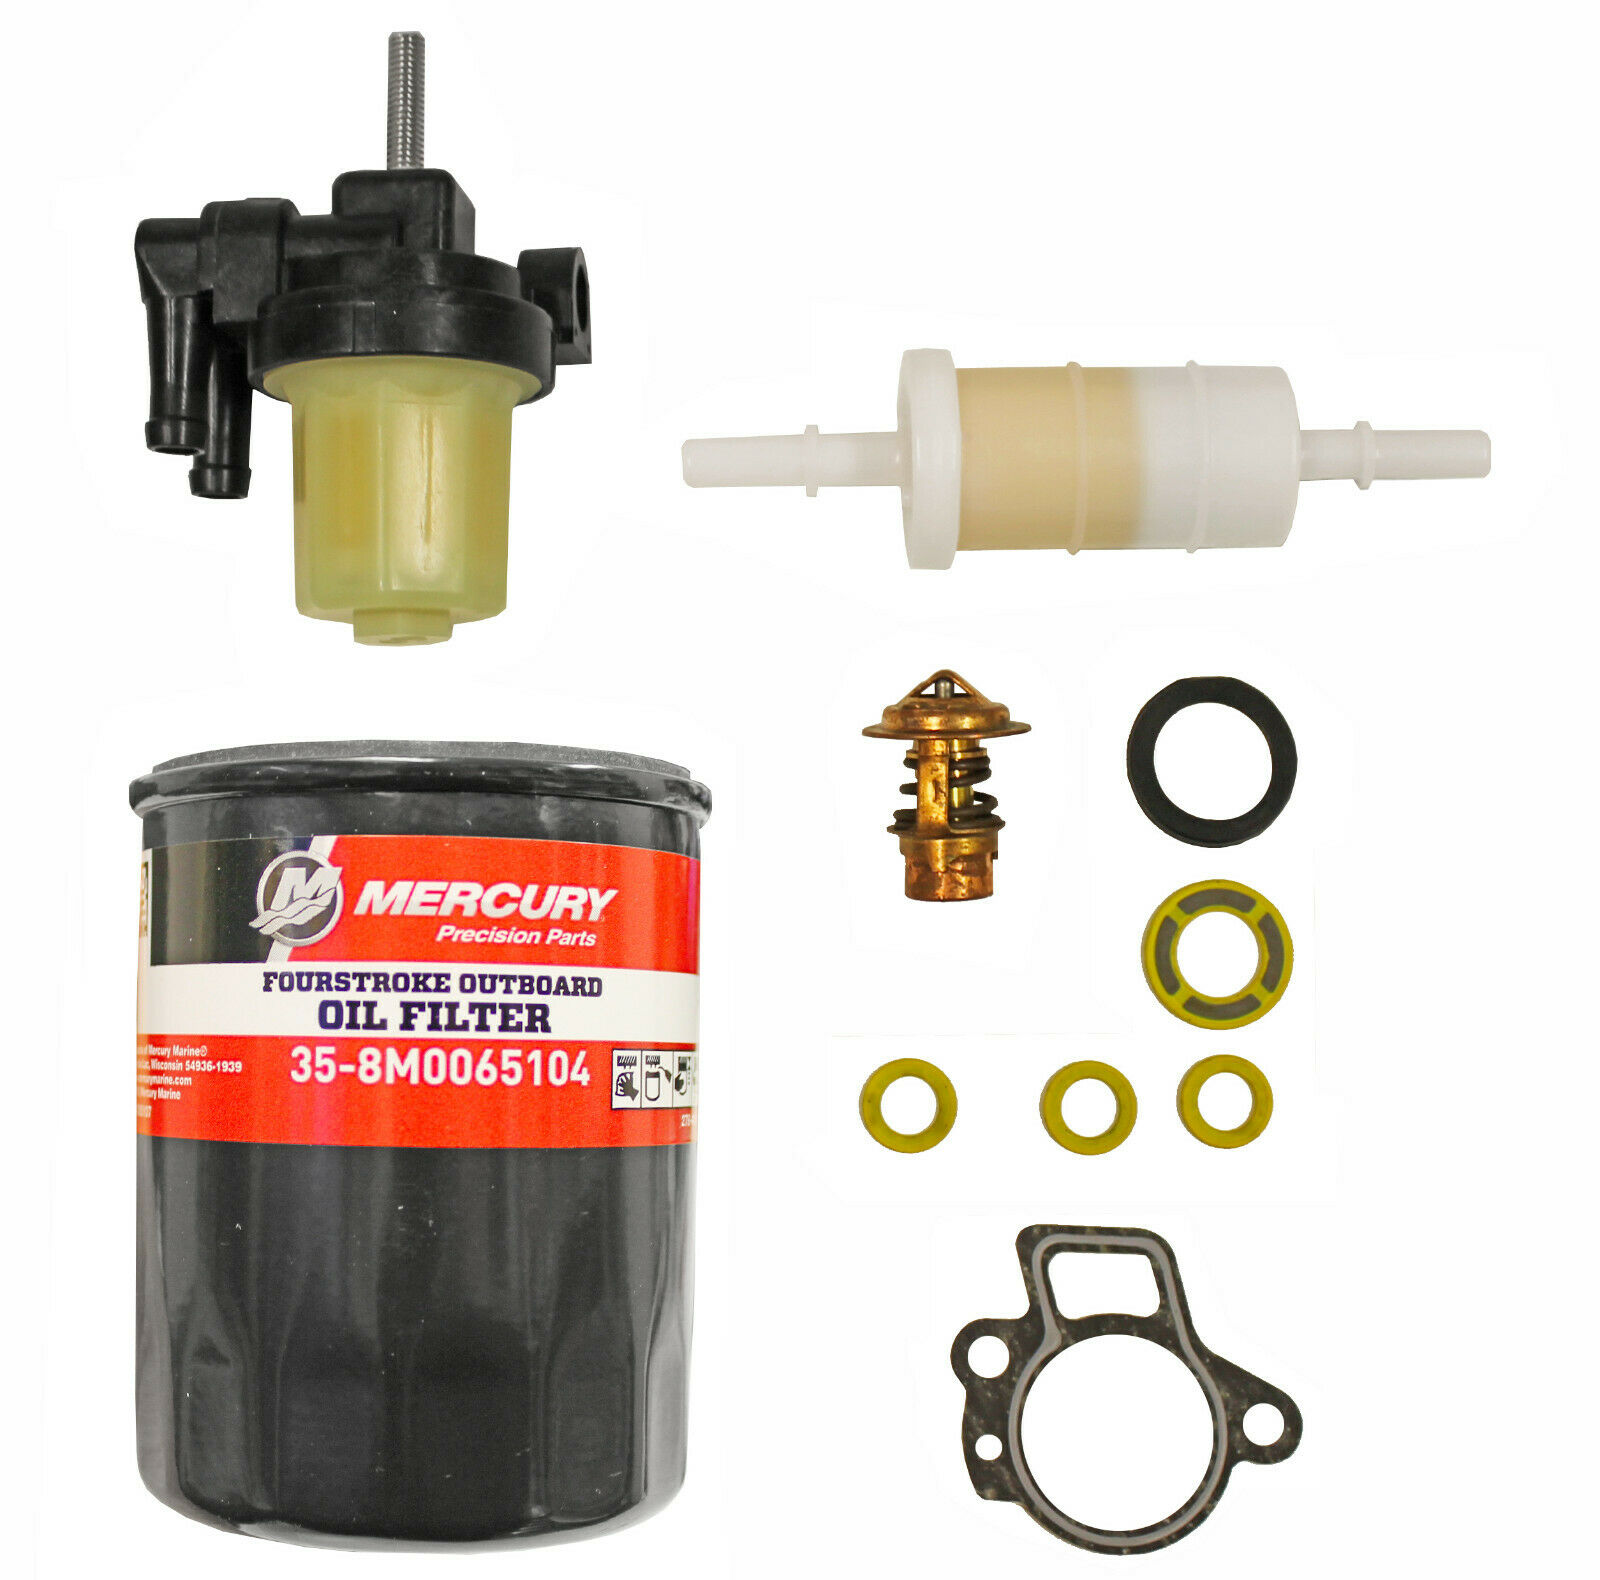 Orig. Mercury Wartungsset 40 50 60PS Ölfilter Benzinfilter Thermostat 8M0090558